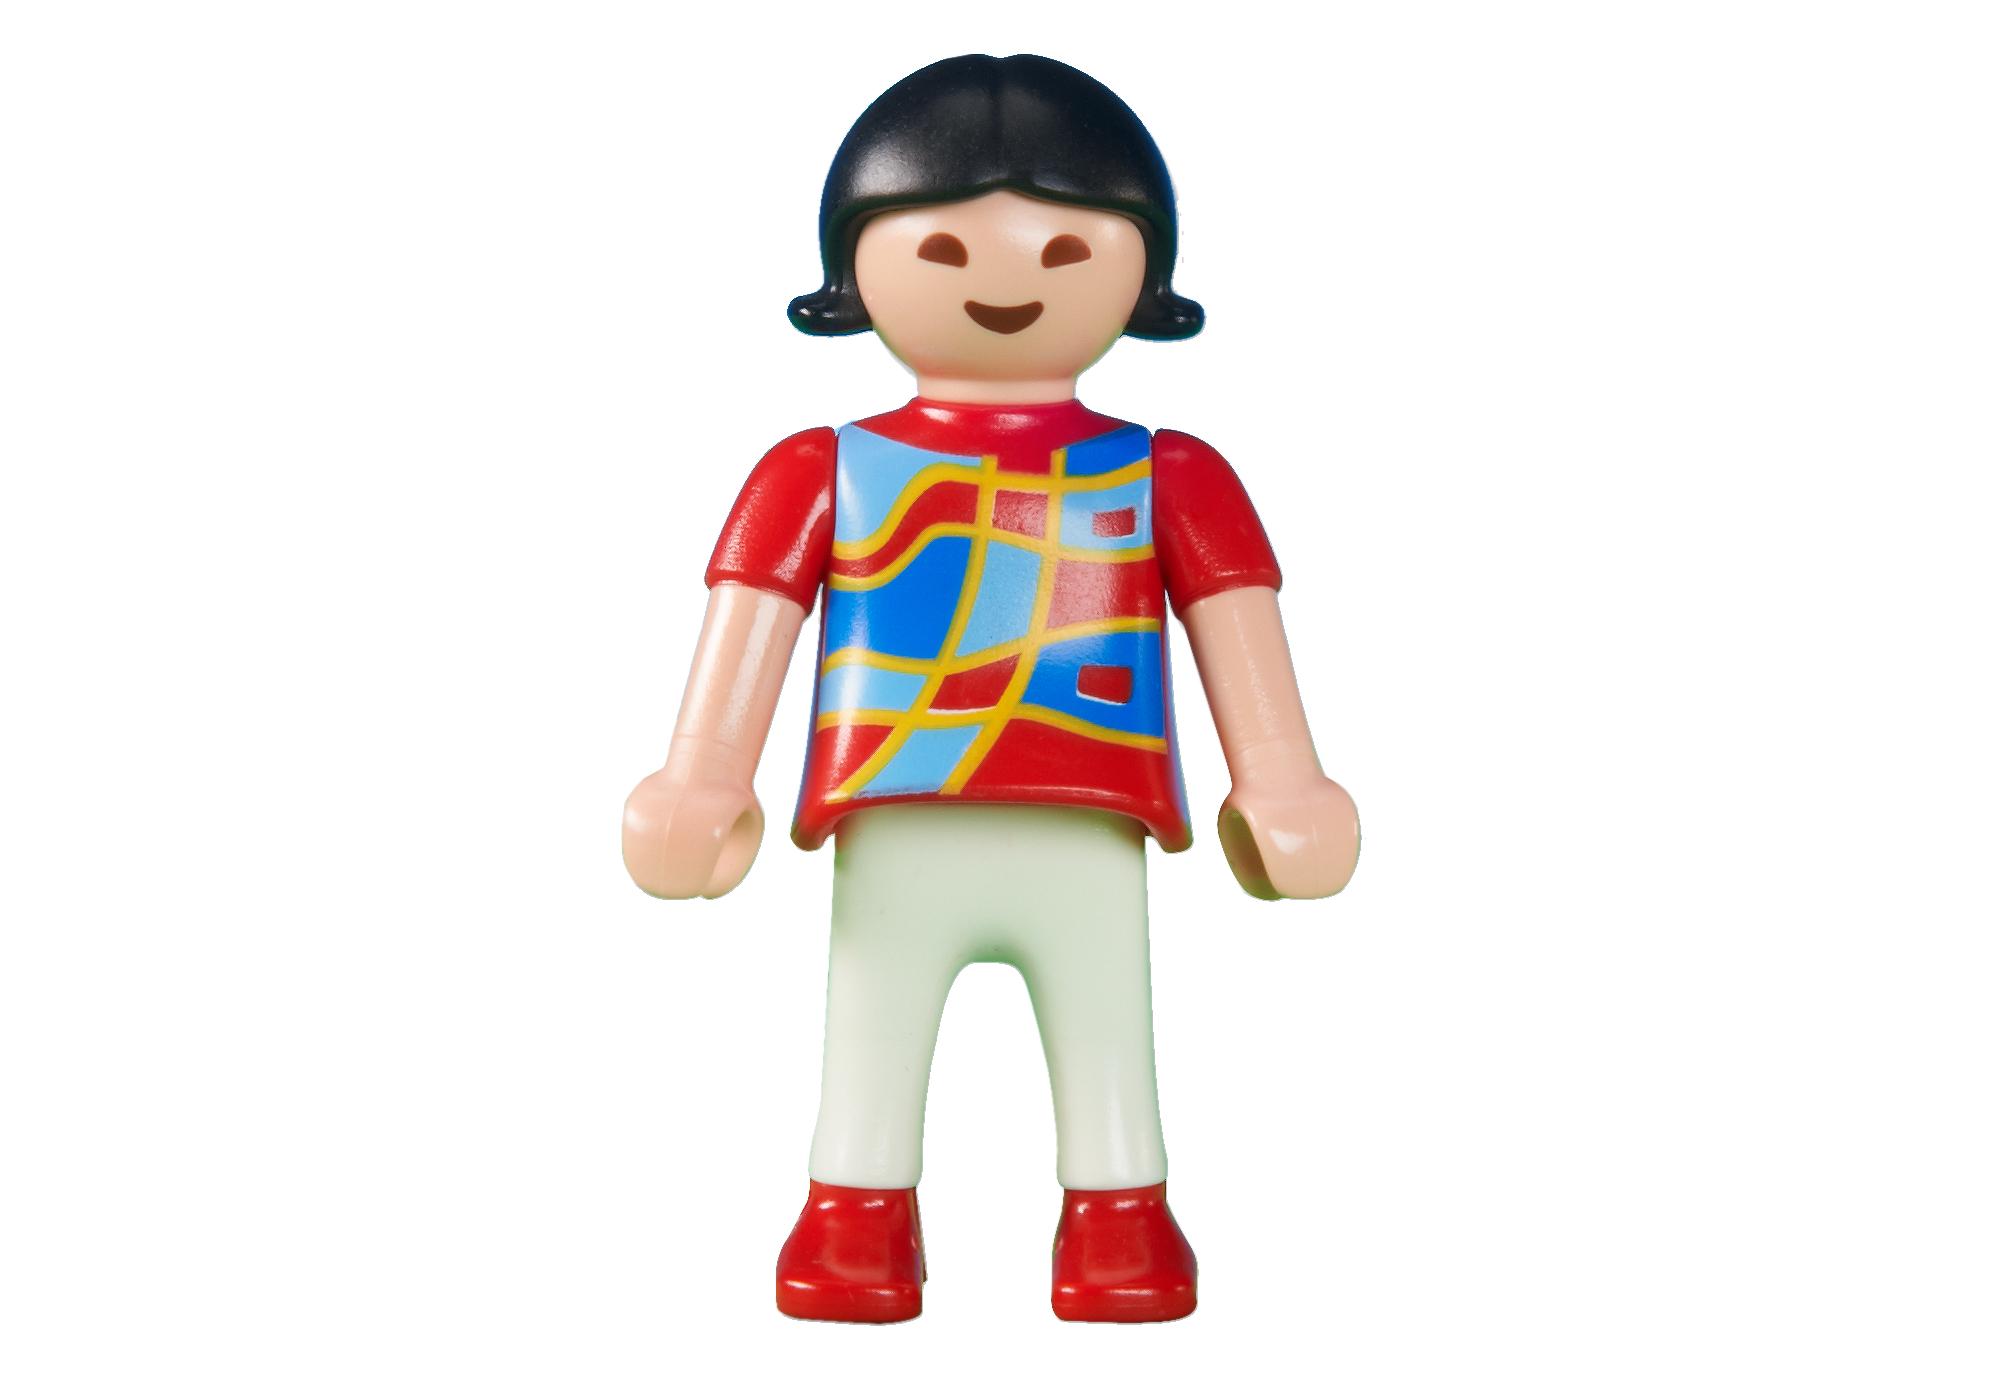 http://media.playmobil.com/i/playmobil/30112260_product_detail/Grundfigur Mädchen